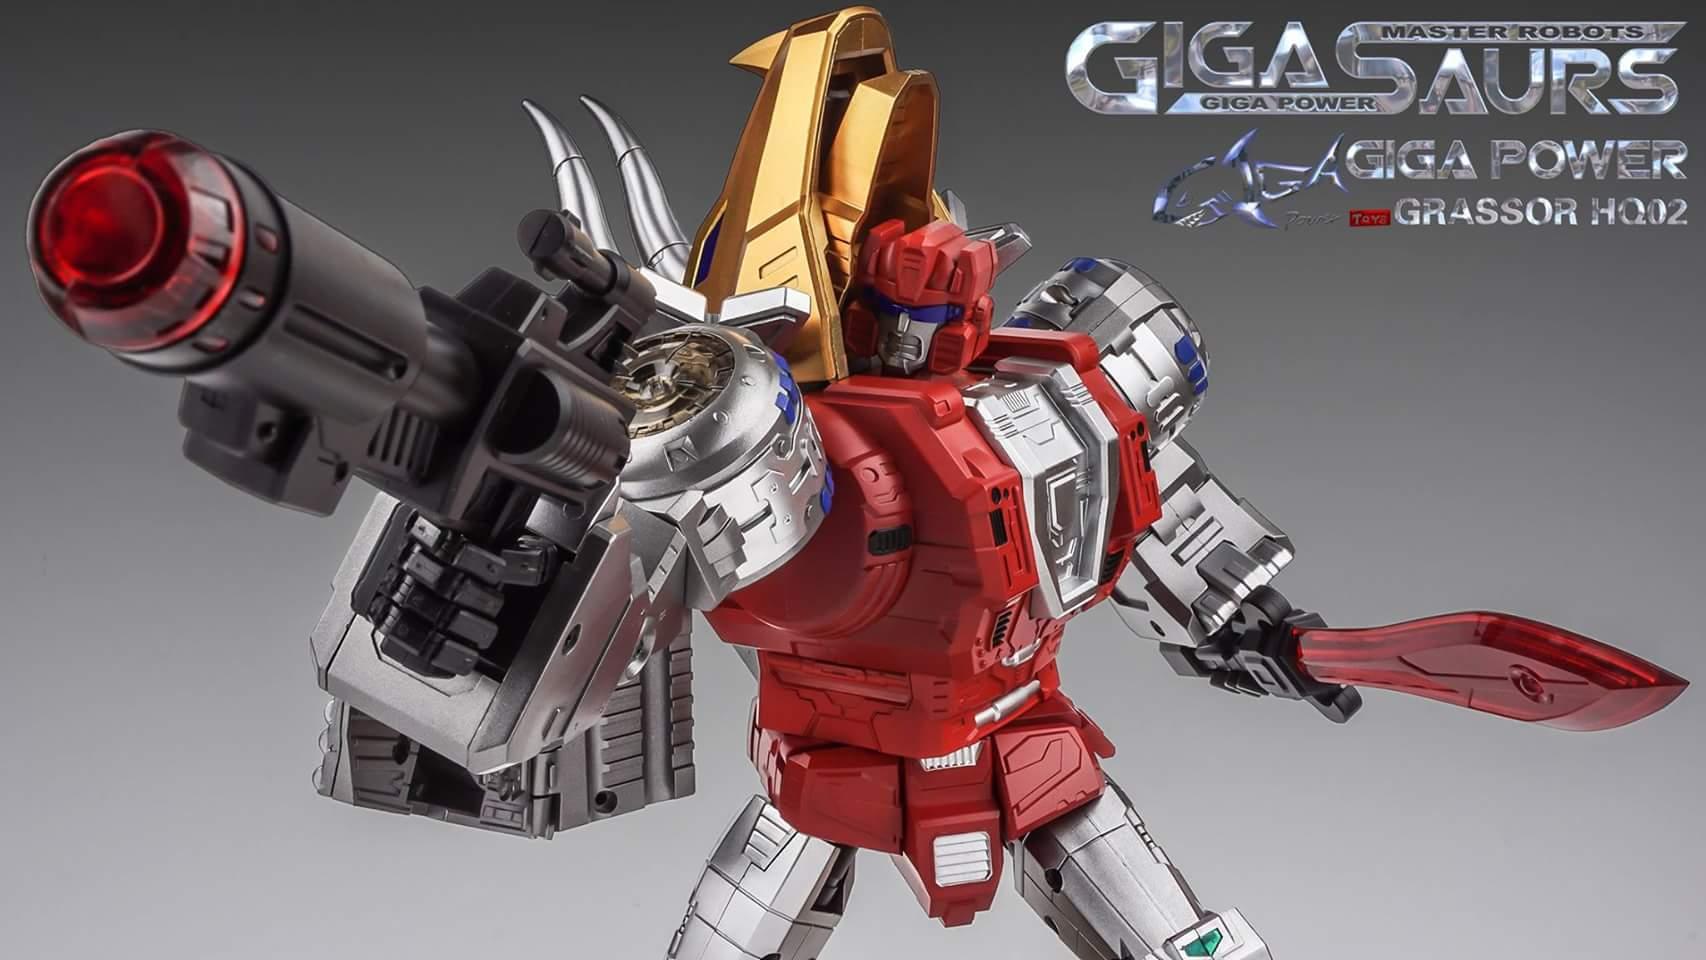 [GigaPower] Produit Tiers - Jouets HQ-01 Superator + HQ-02 Grassor + HQ-03 Guttur + HQ-04 Graviter + HQ-05 Gaudenter - aka Dinobots - Page 5 OnyLrImm